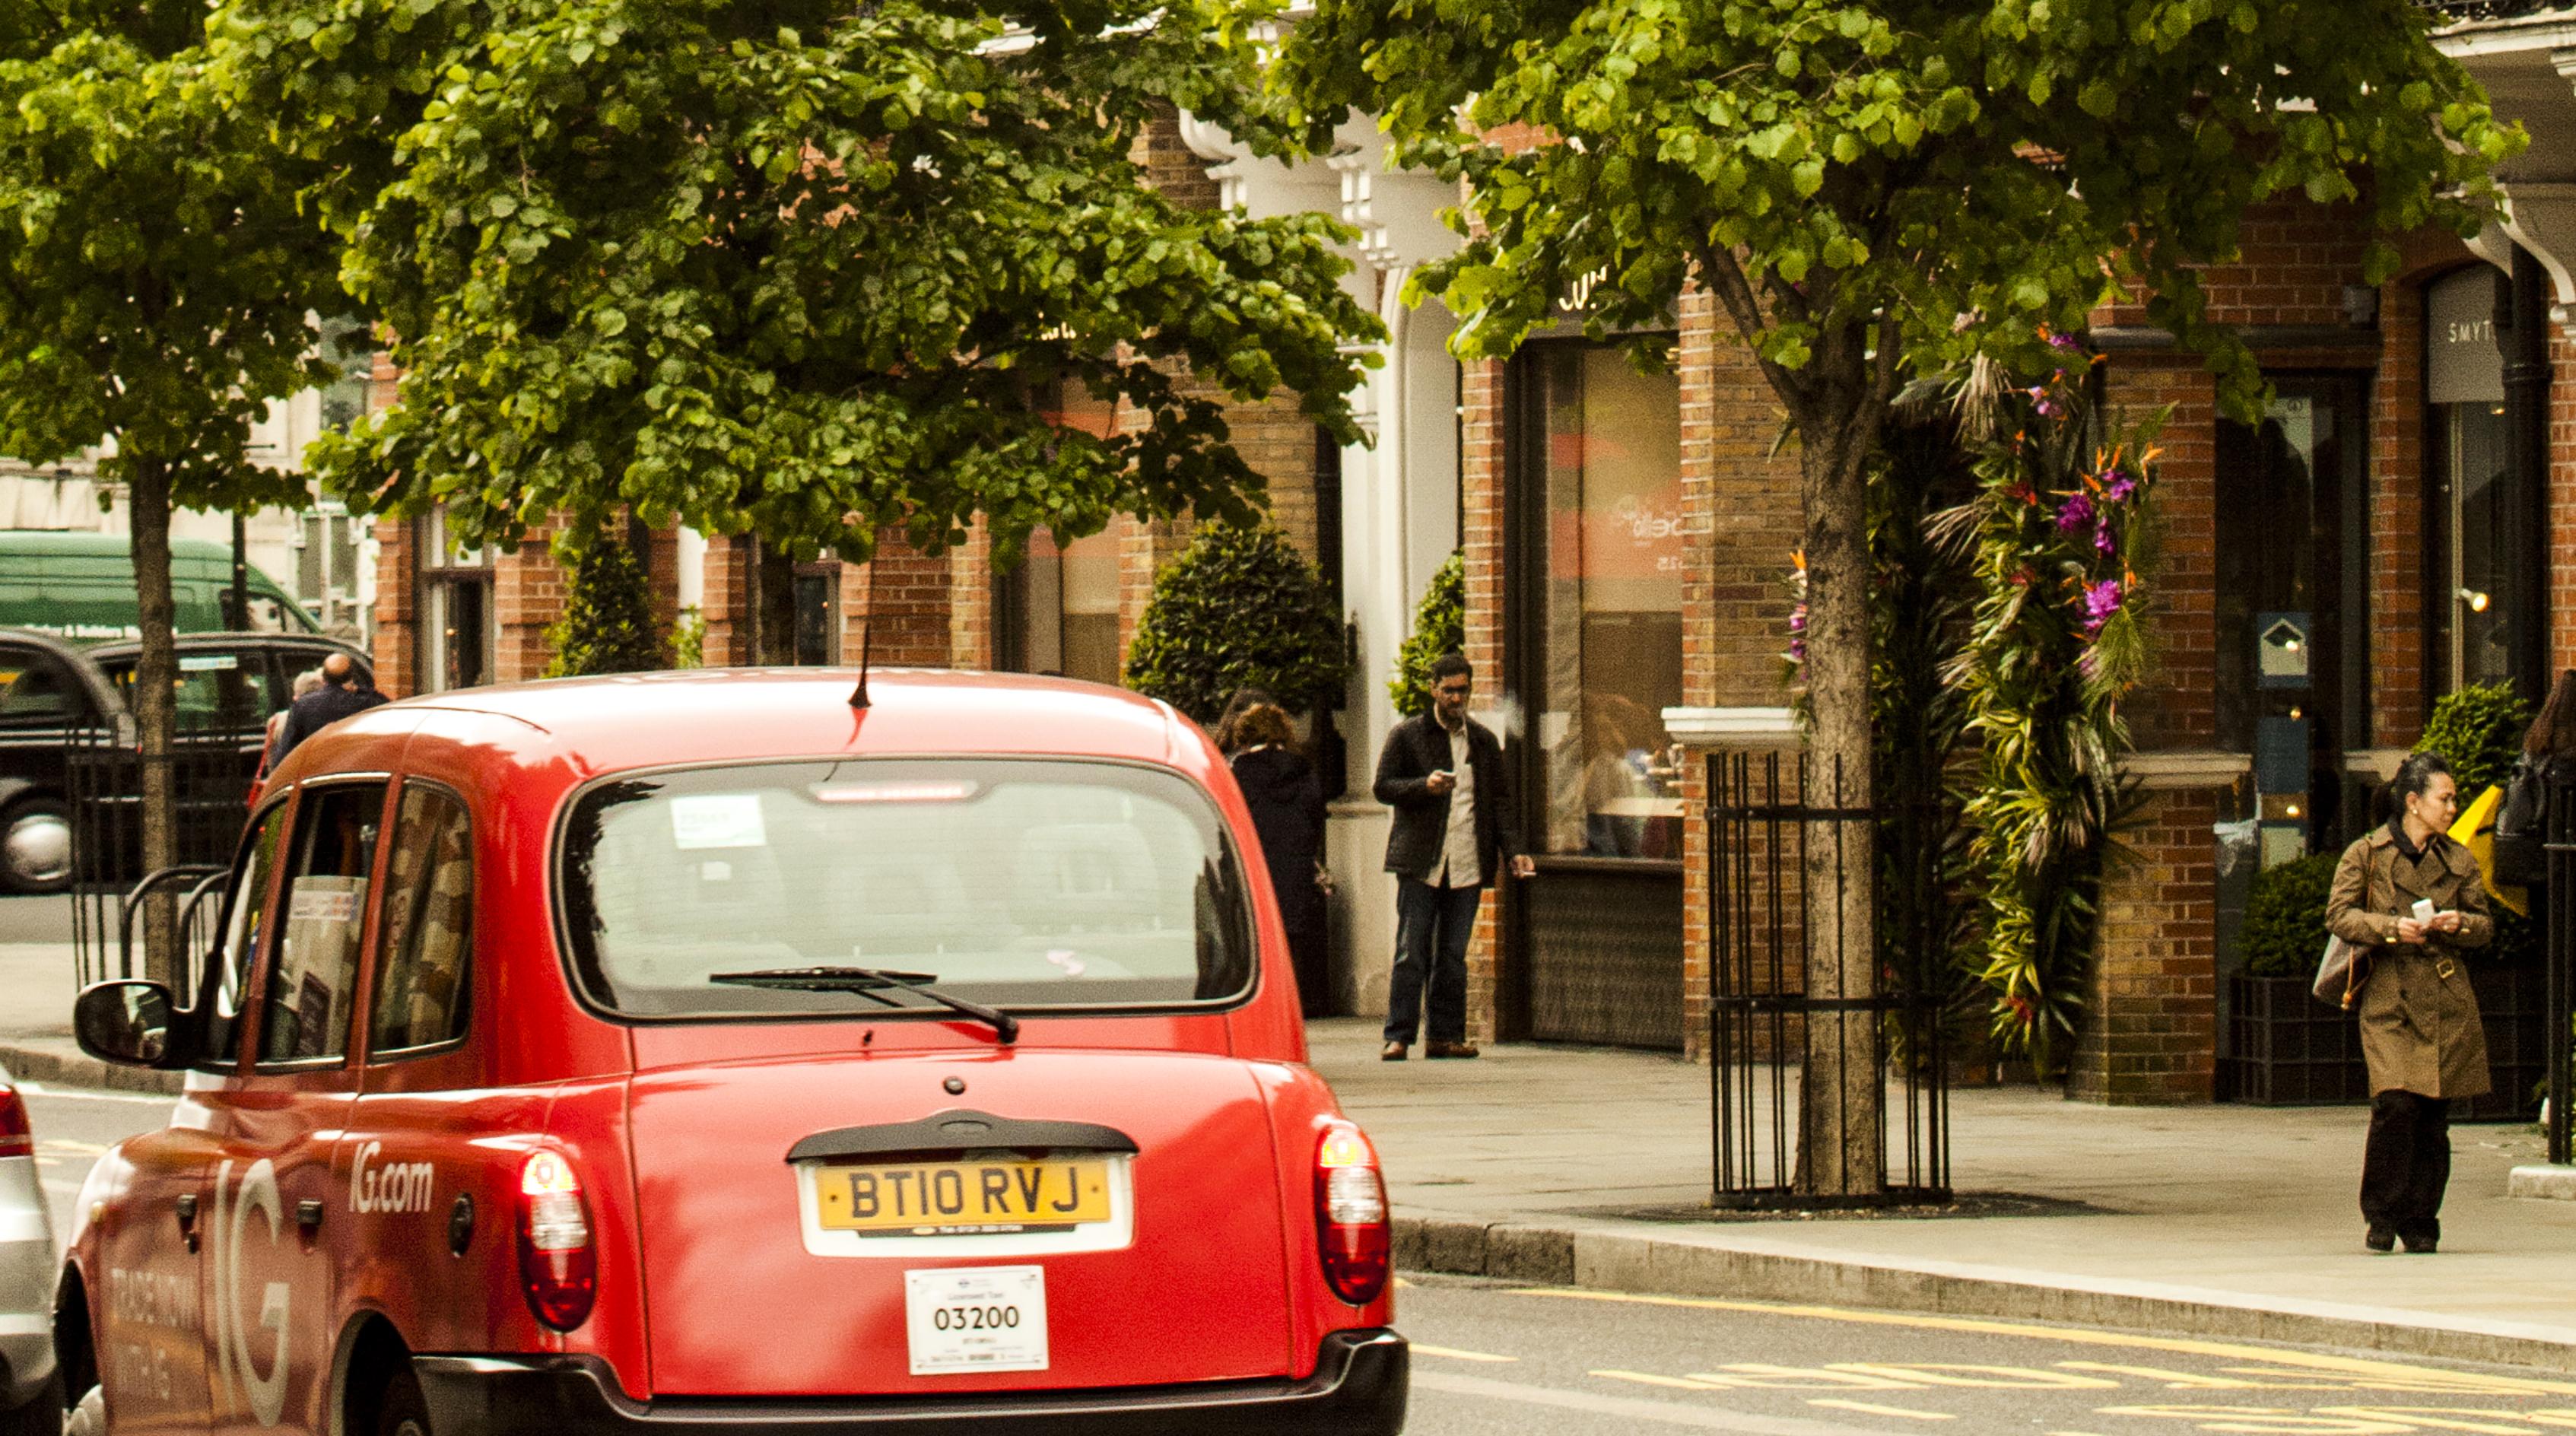 Calles de Kensington Ciudad de Londres. UK